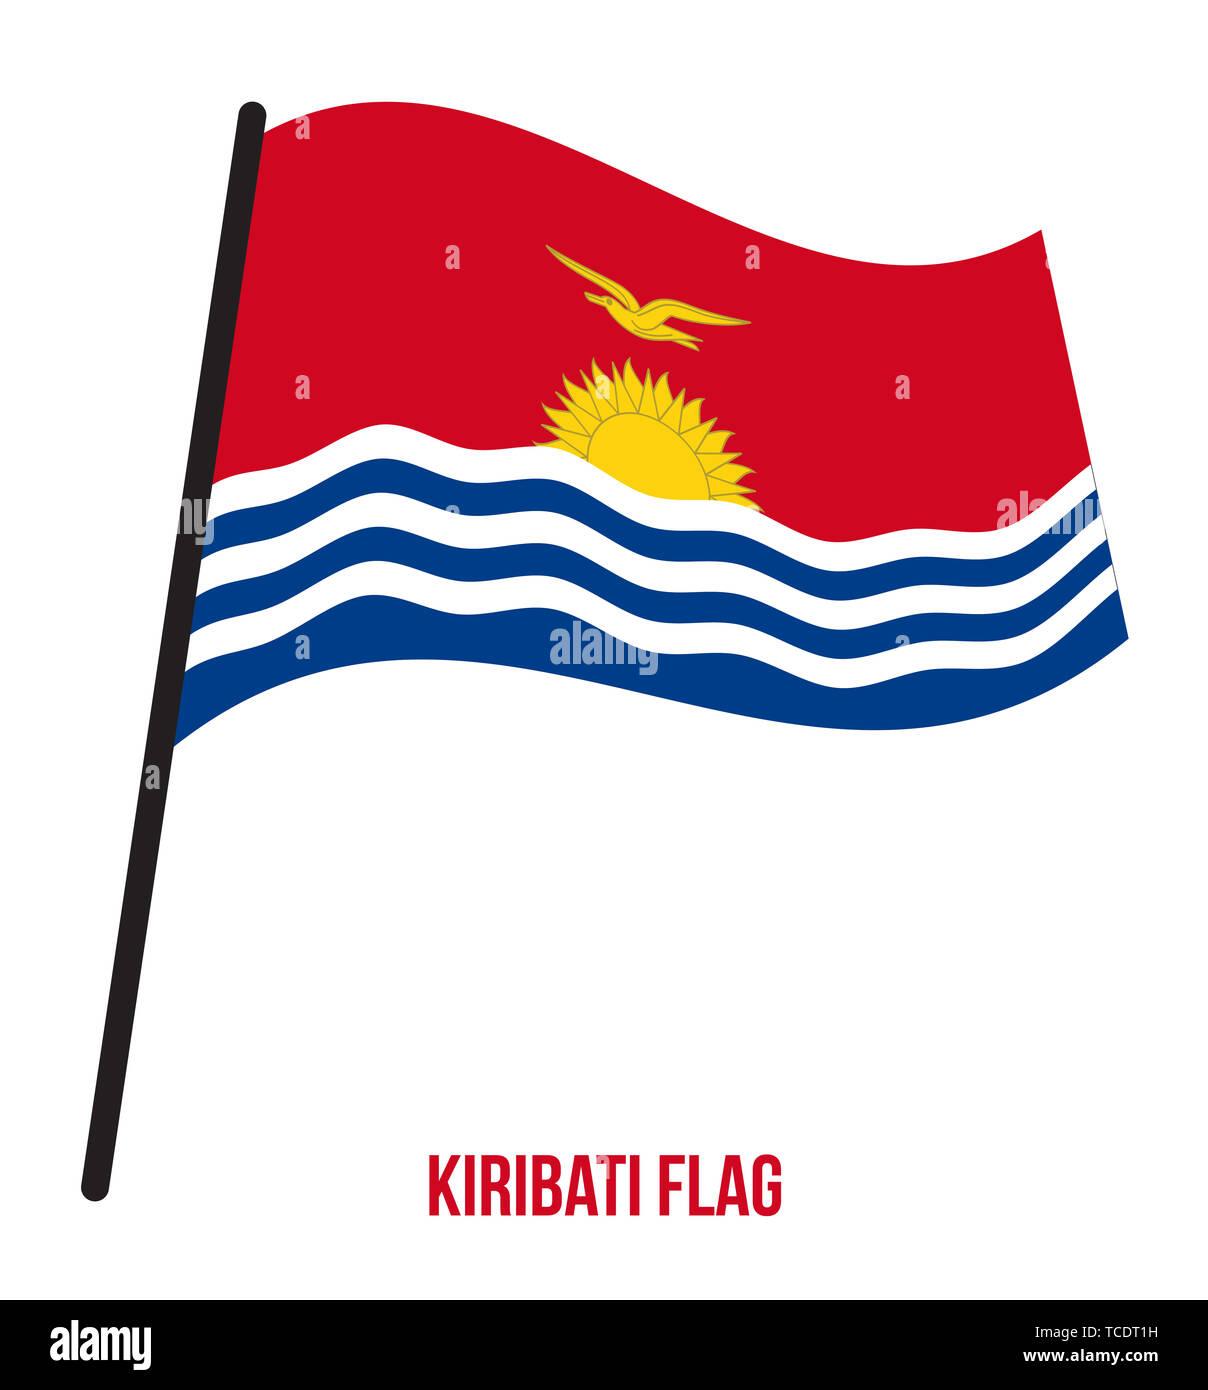 Kiribati Flag Waving Vector Illustration on White Background. Kiribati National Flag. - Stock Image